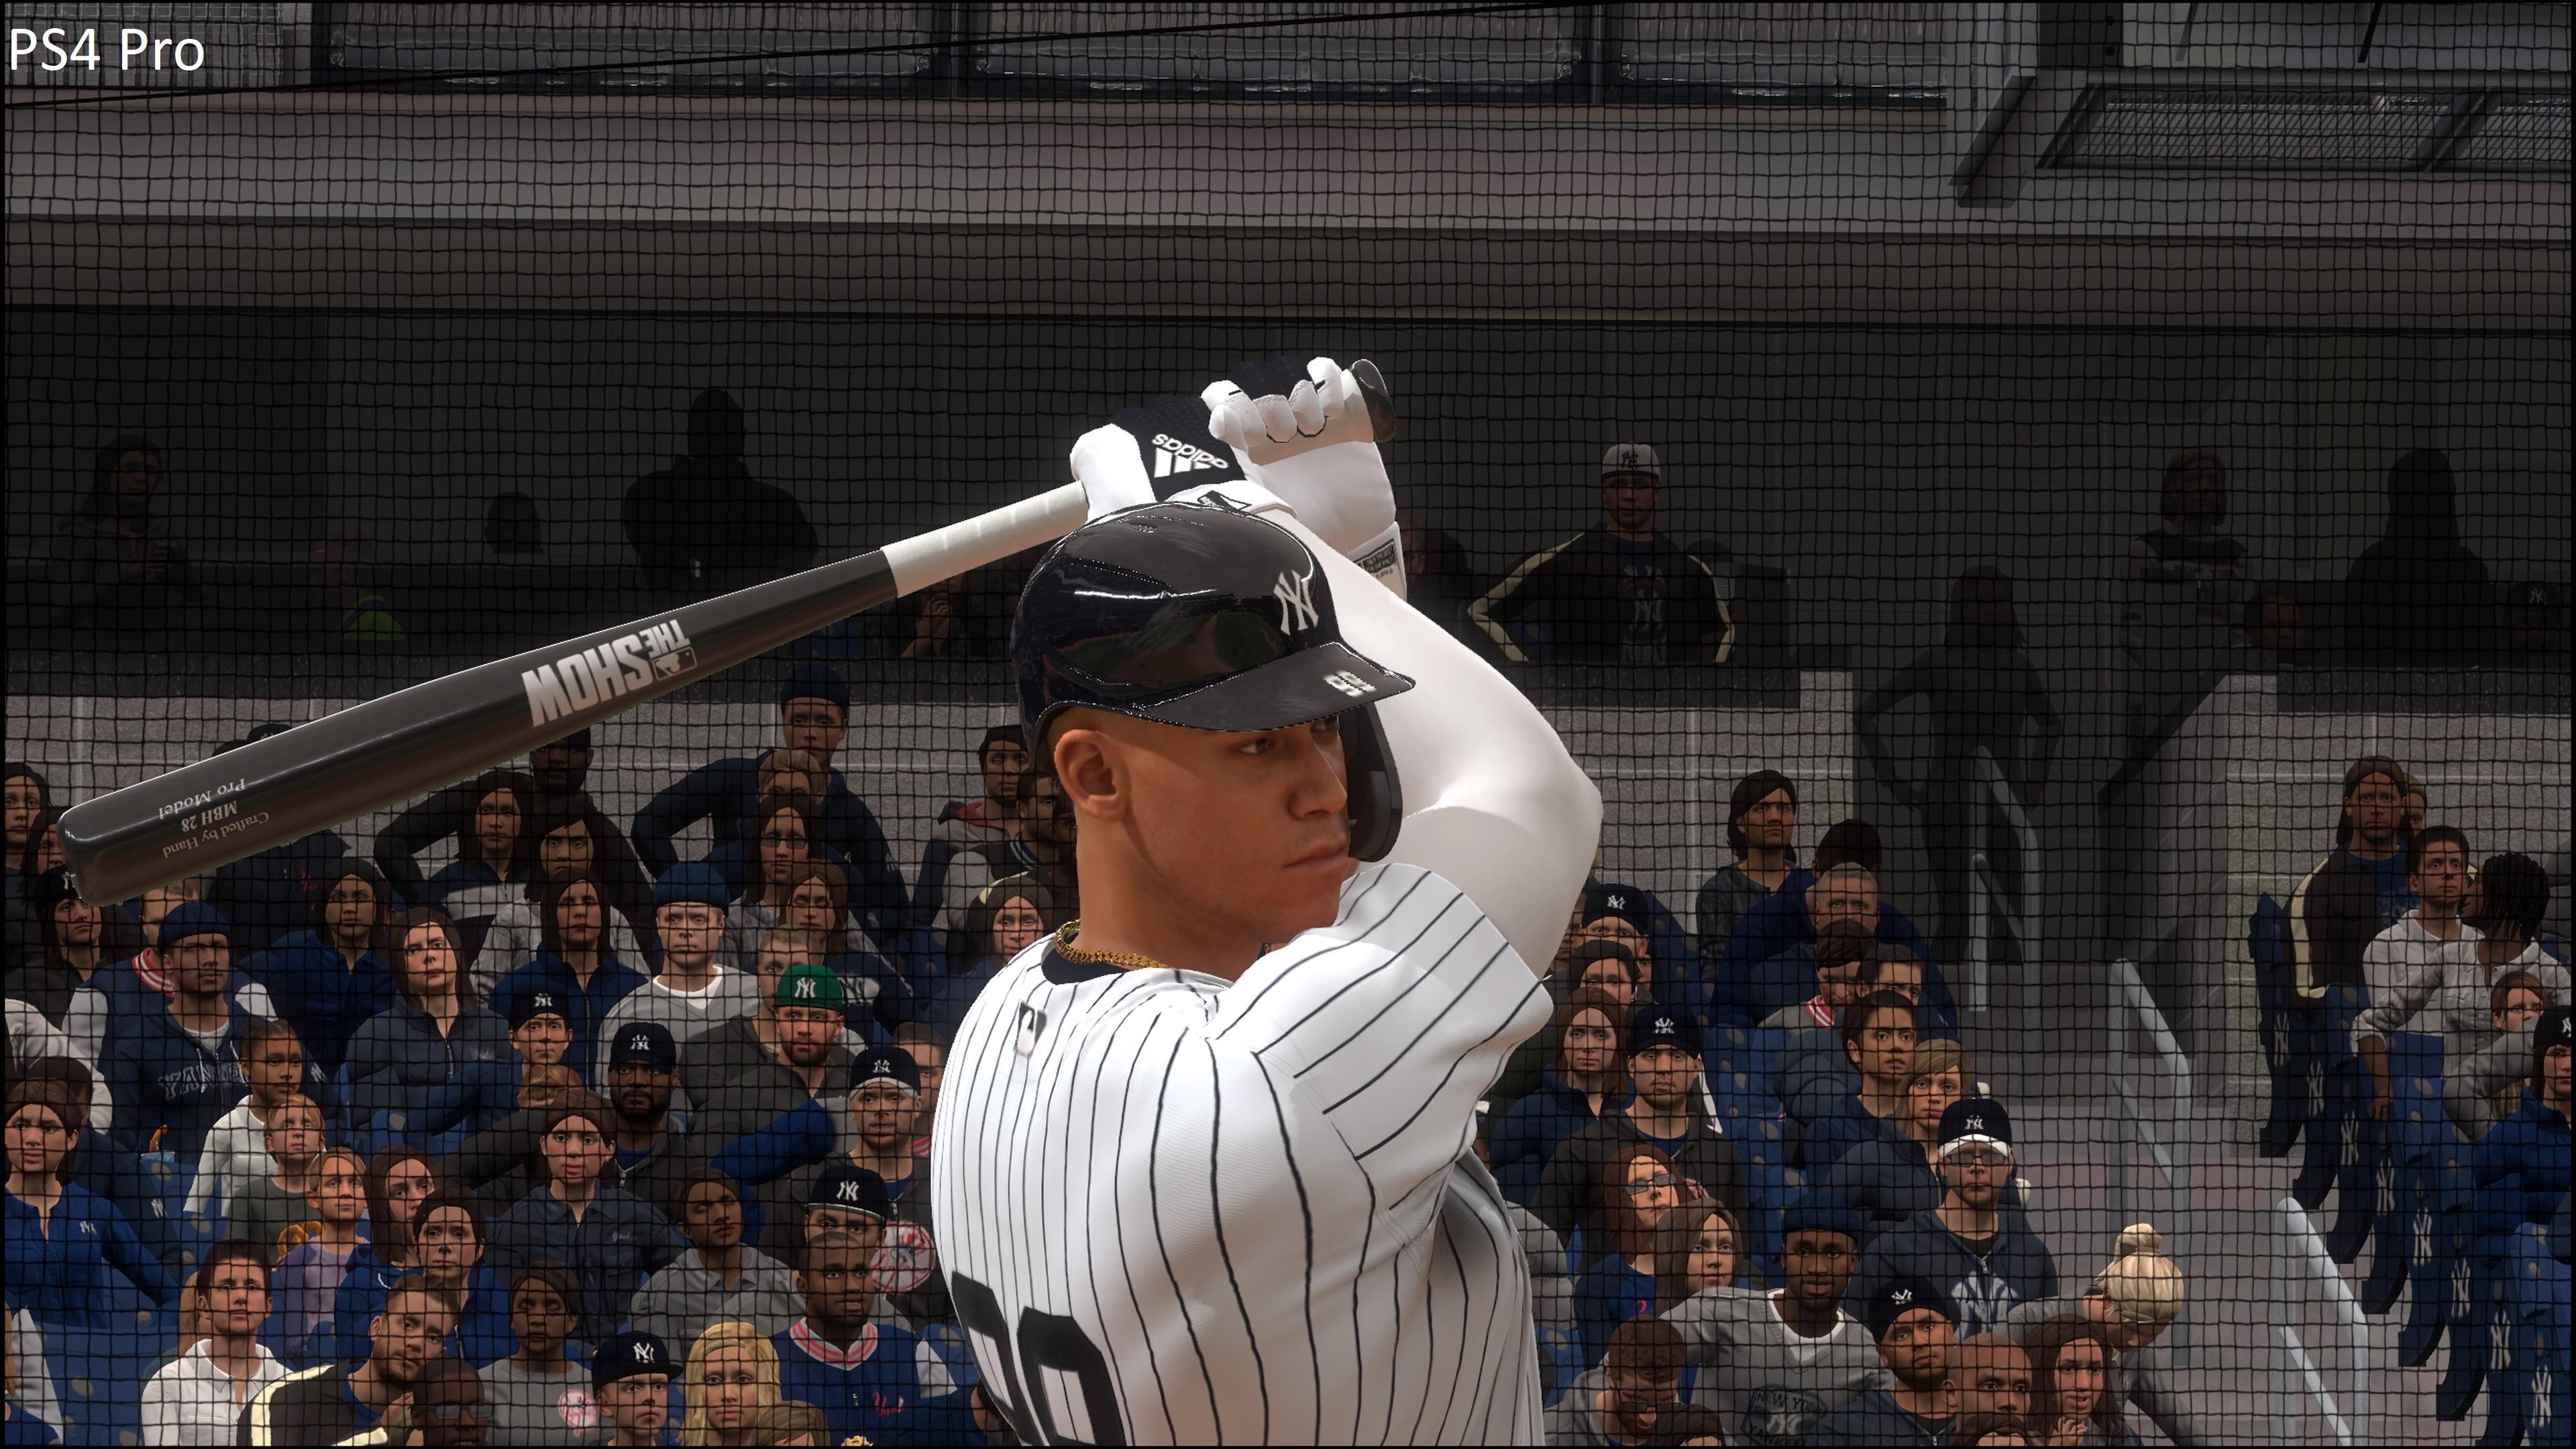 PS4 Pro Judge MLB(R) The Show(TM) 21